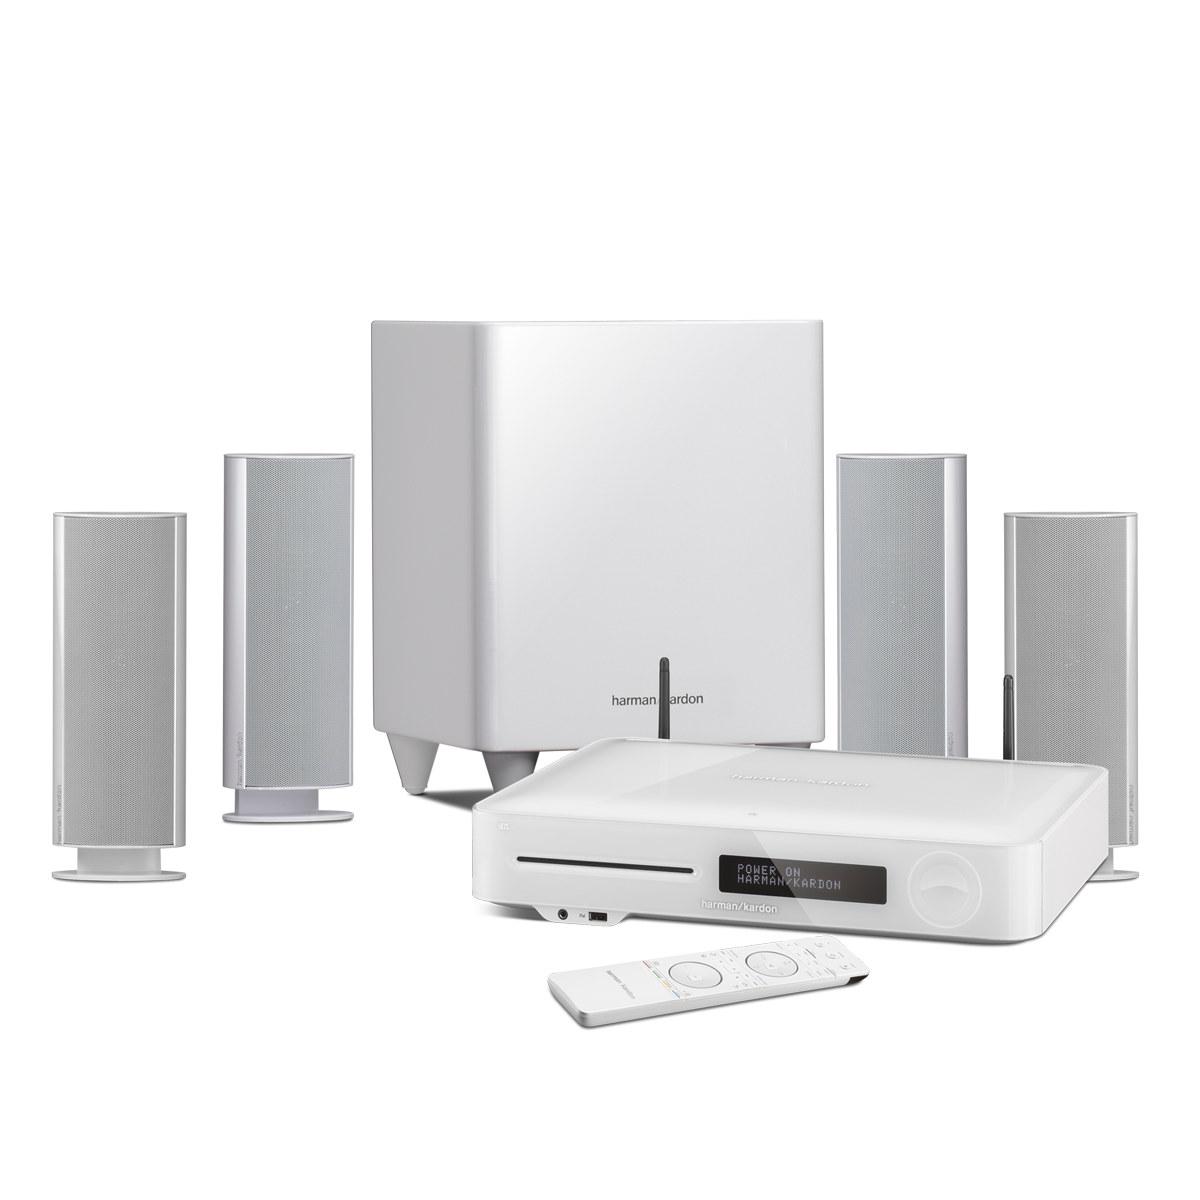 harman kardon bds 780 blanc ensemble home cin ma harman kardon sur. Black Bedroom Furniture Sets. Home Design Ideas